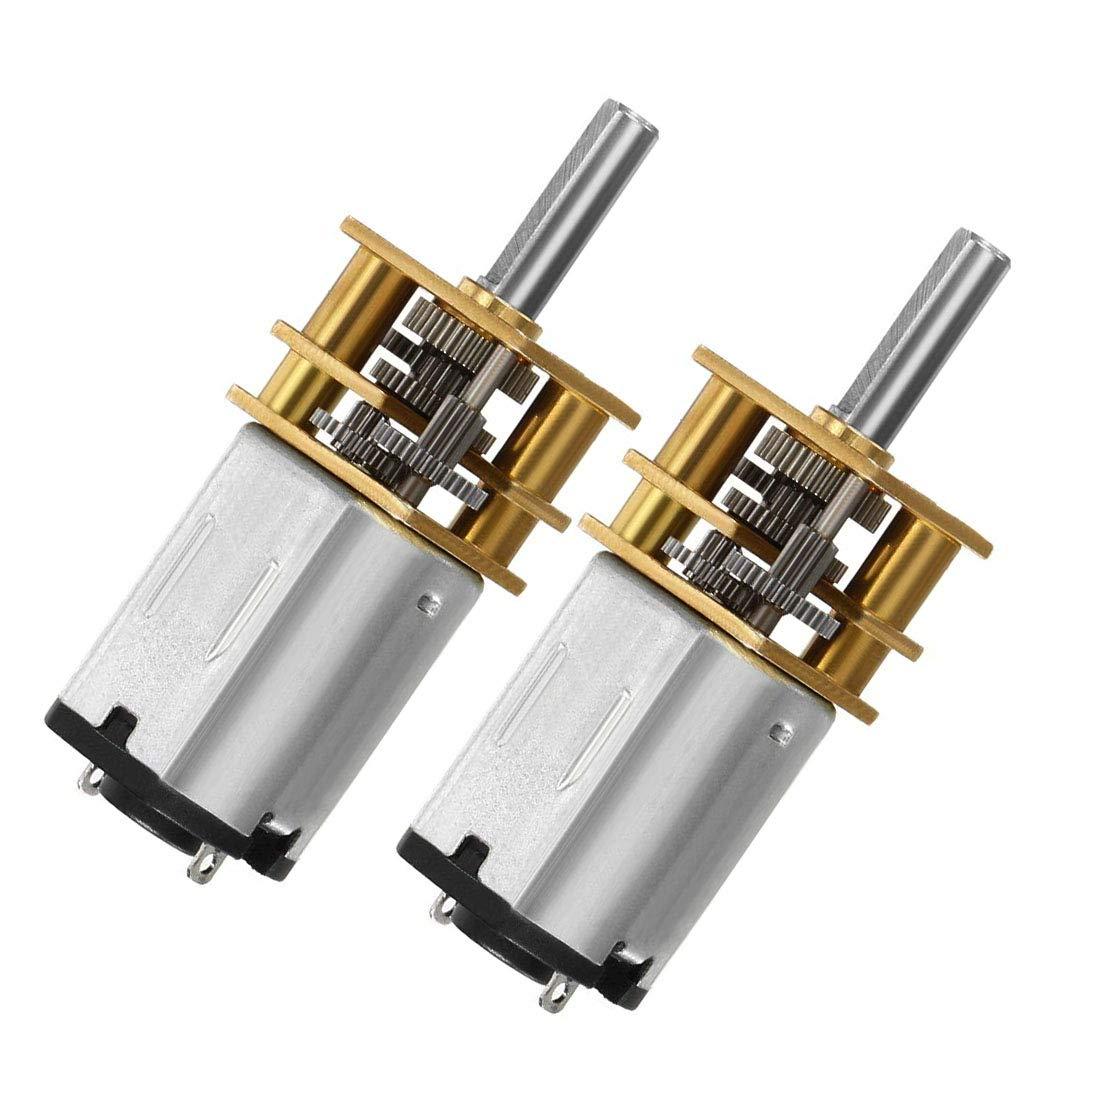 Aodesy DC Gear Motor Electric Gear Box DC 6V Gear Box Reduction Motor with Long Output Shaft 30RPM 2Pcs (2Pcs 6V 30RPM)